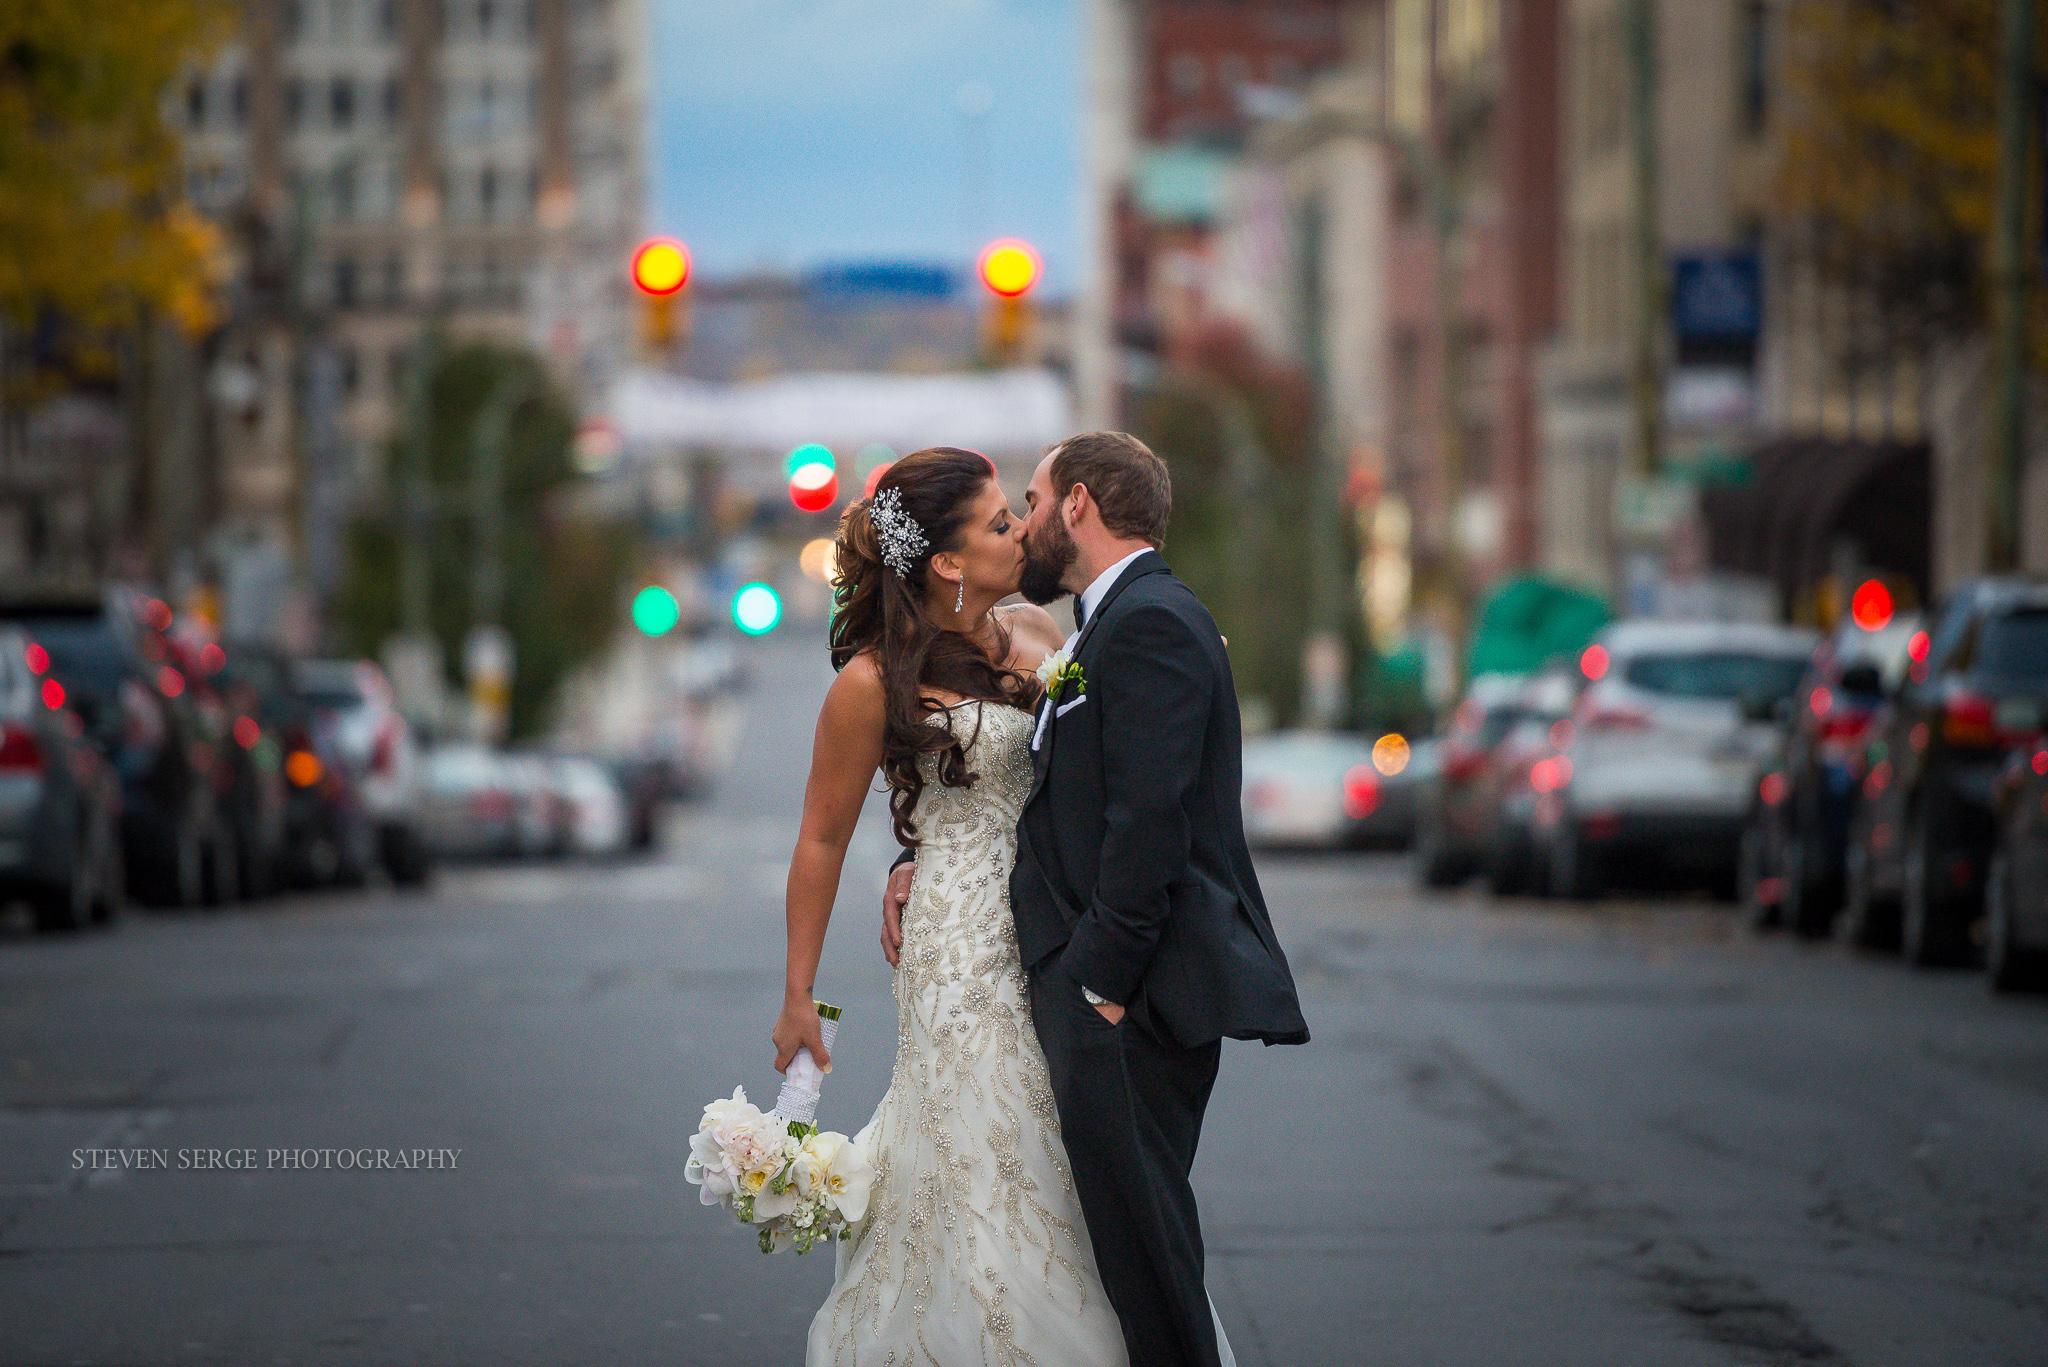 Denn-NEPA-Scranton-wedding-photographer-cultural-downtown-street-photography-dress-2.jpg